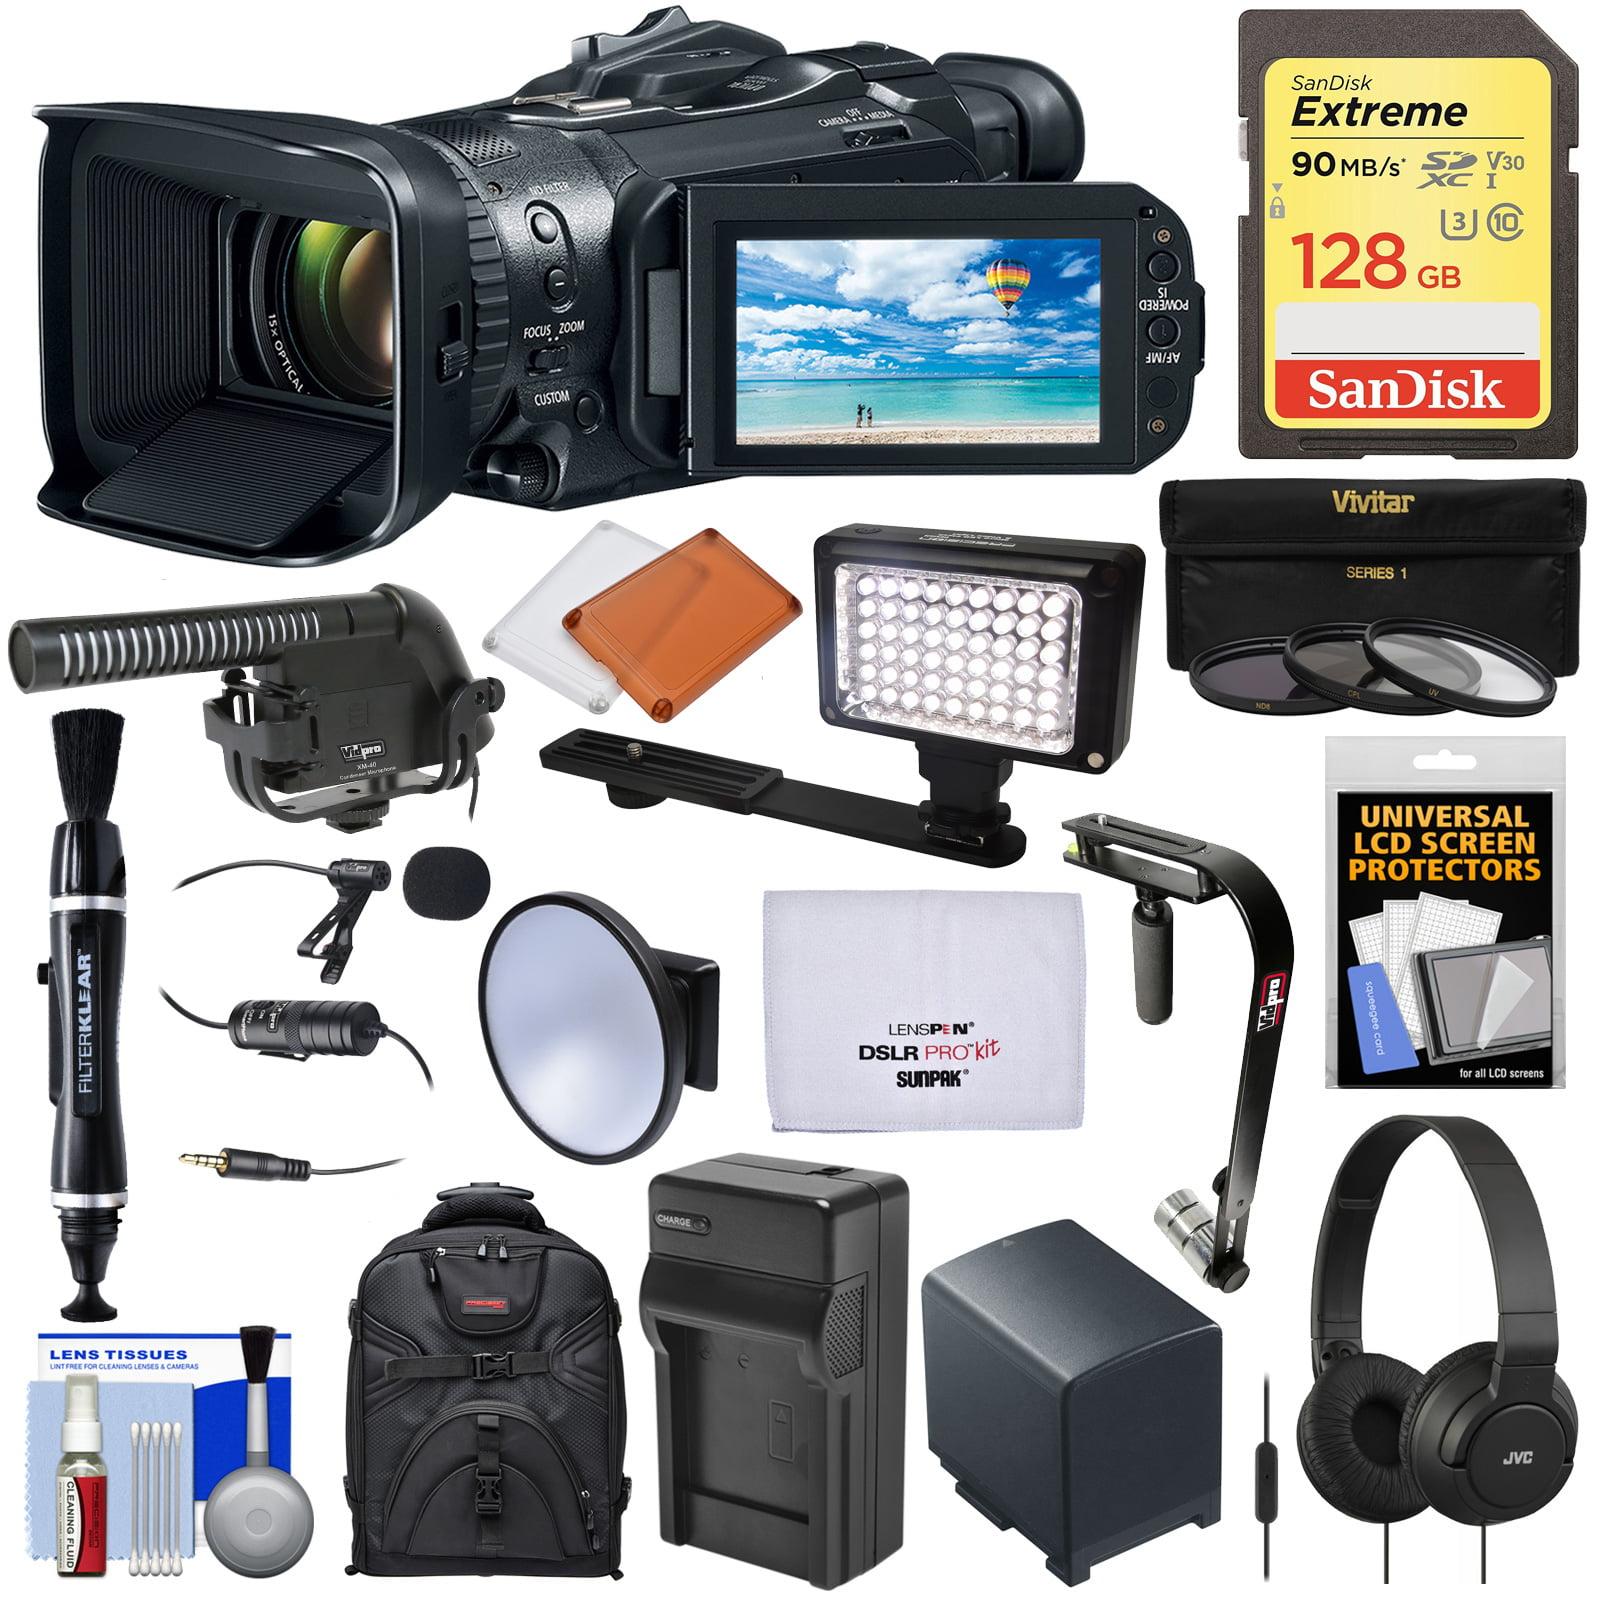 Canon Vixia GX10 Wi-Fi 4K Ultra HD Digital Video Camcorde...